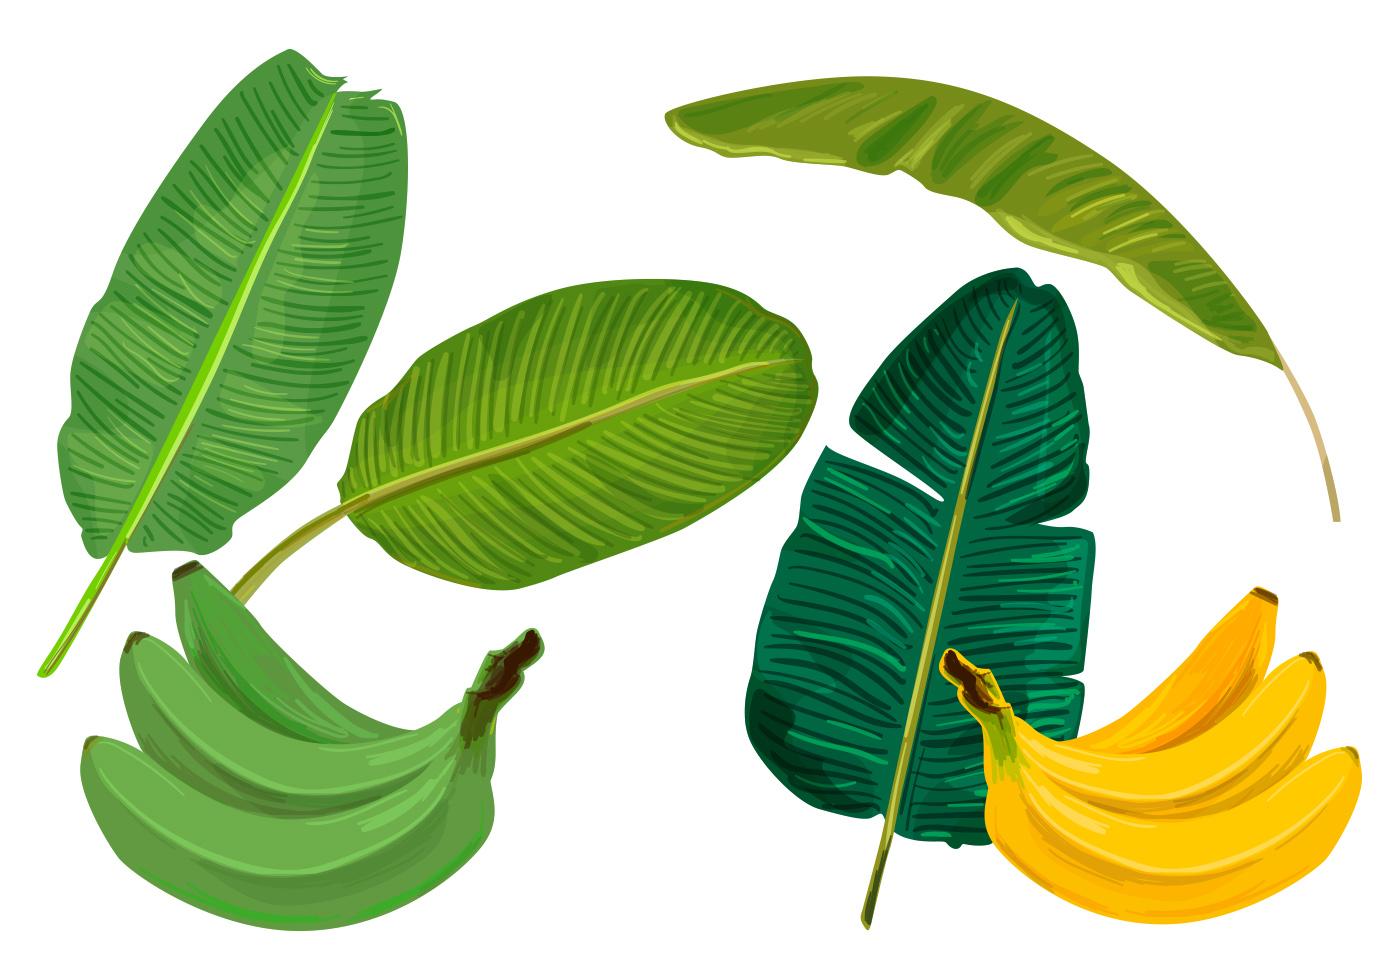 Tree Quote Wallpaper Mac Banana Leaves Vectors Download Free Vector Art Stock